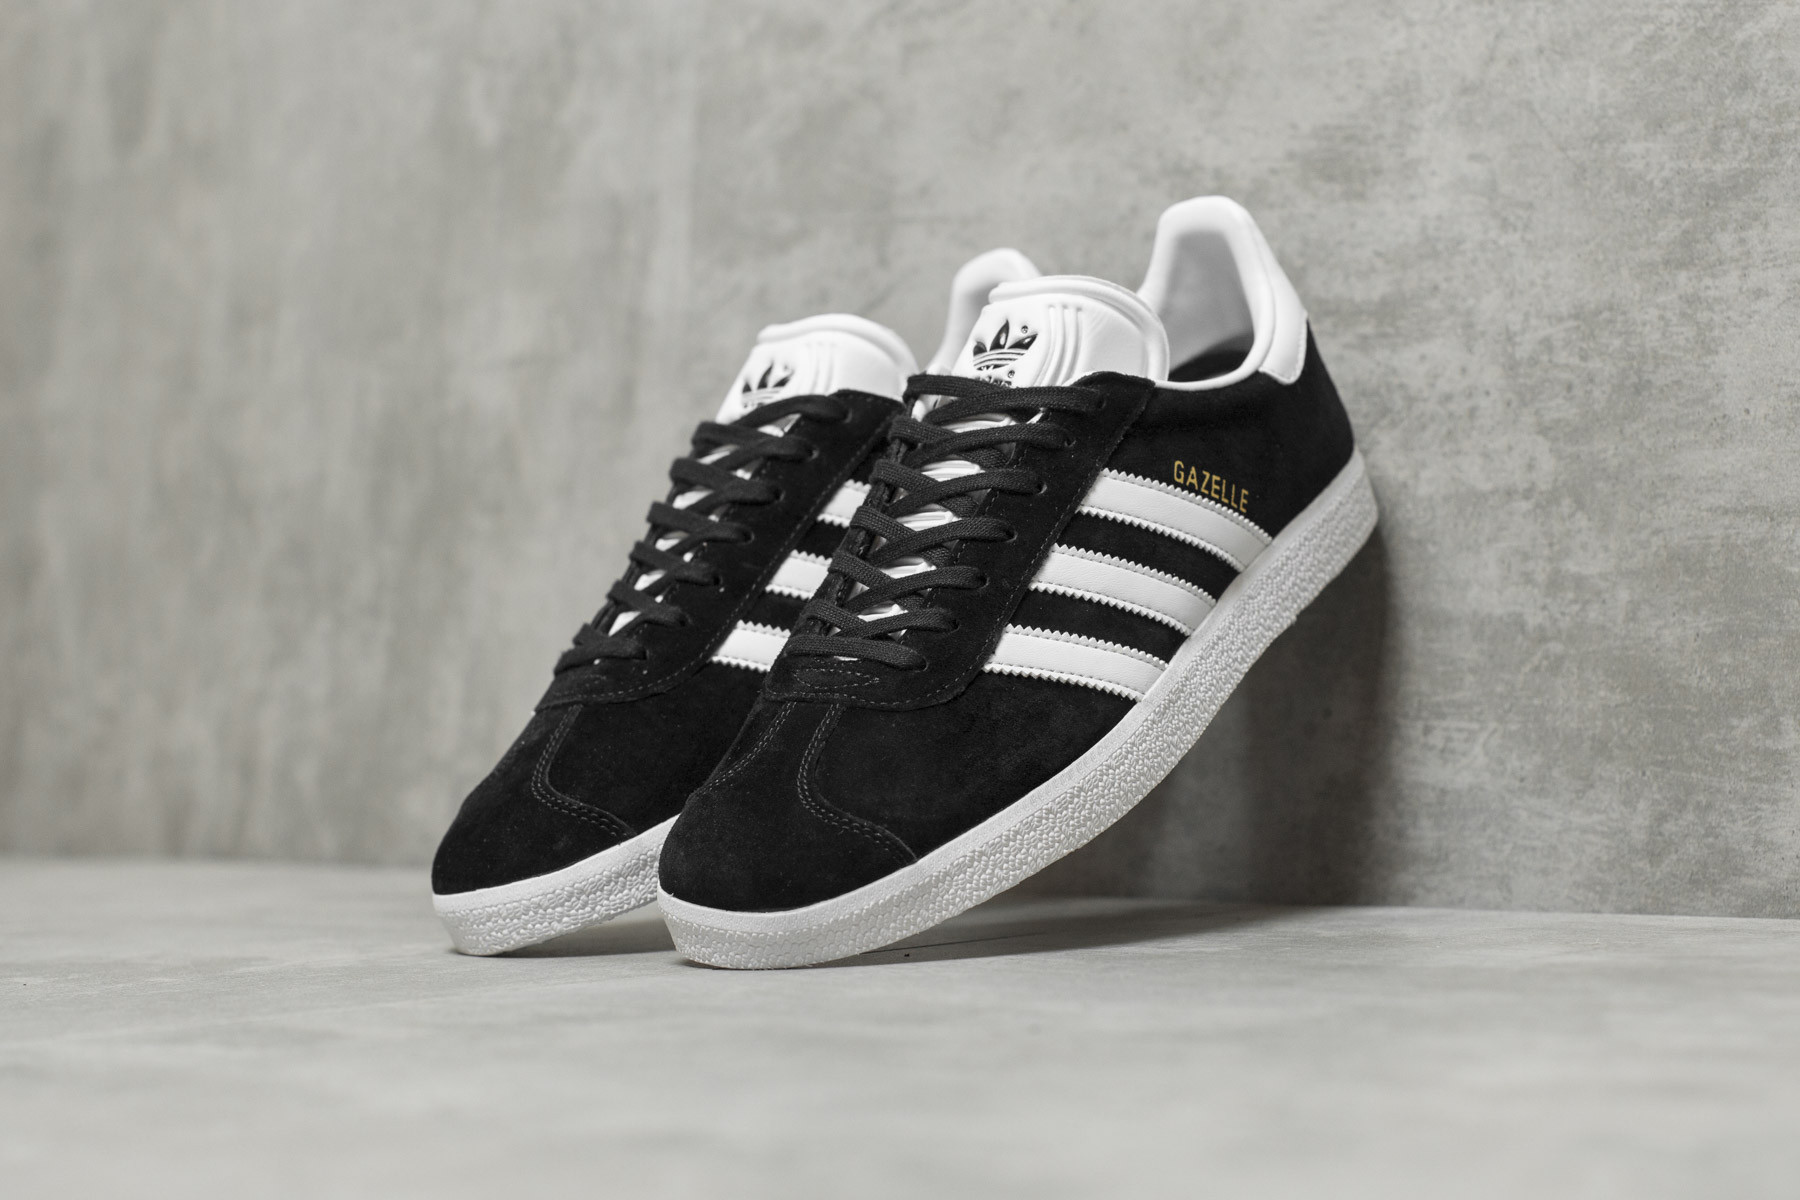 sneakers for cheap 73d47 79e5f Adidas Gazelle - Herre - Sneakers - Sneaker.no